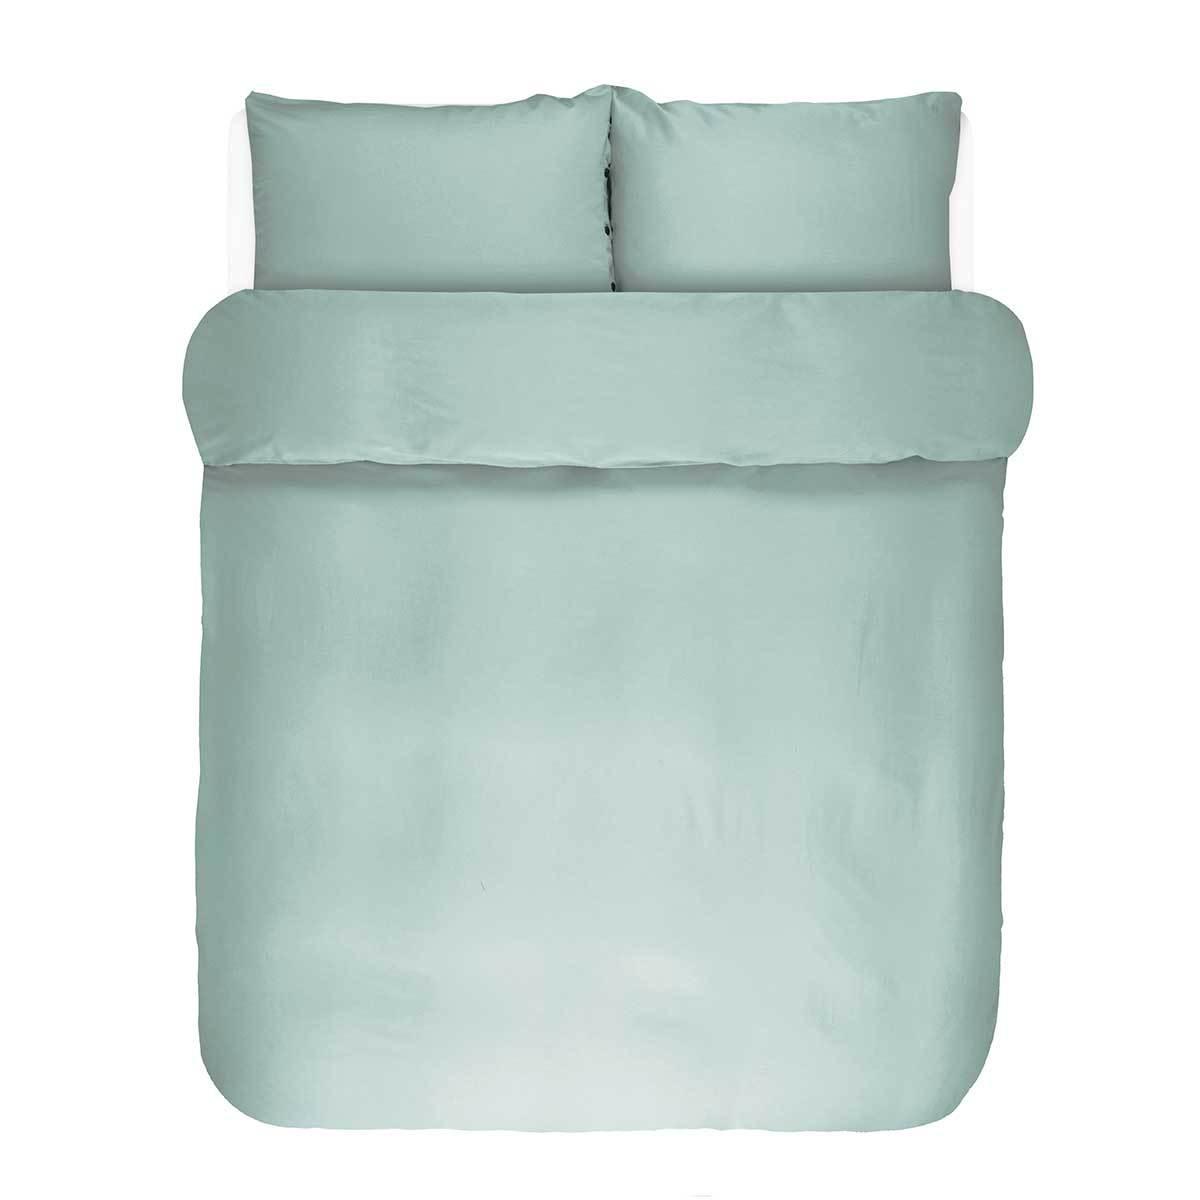 marc o polo tencel bettw sche vora aqua g nstig online kaufen bei bettwaren shop. Black Bedroom Furniture Sets. Home Design Ideas